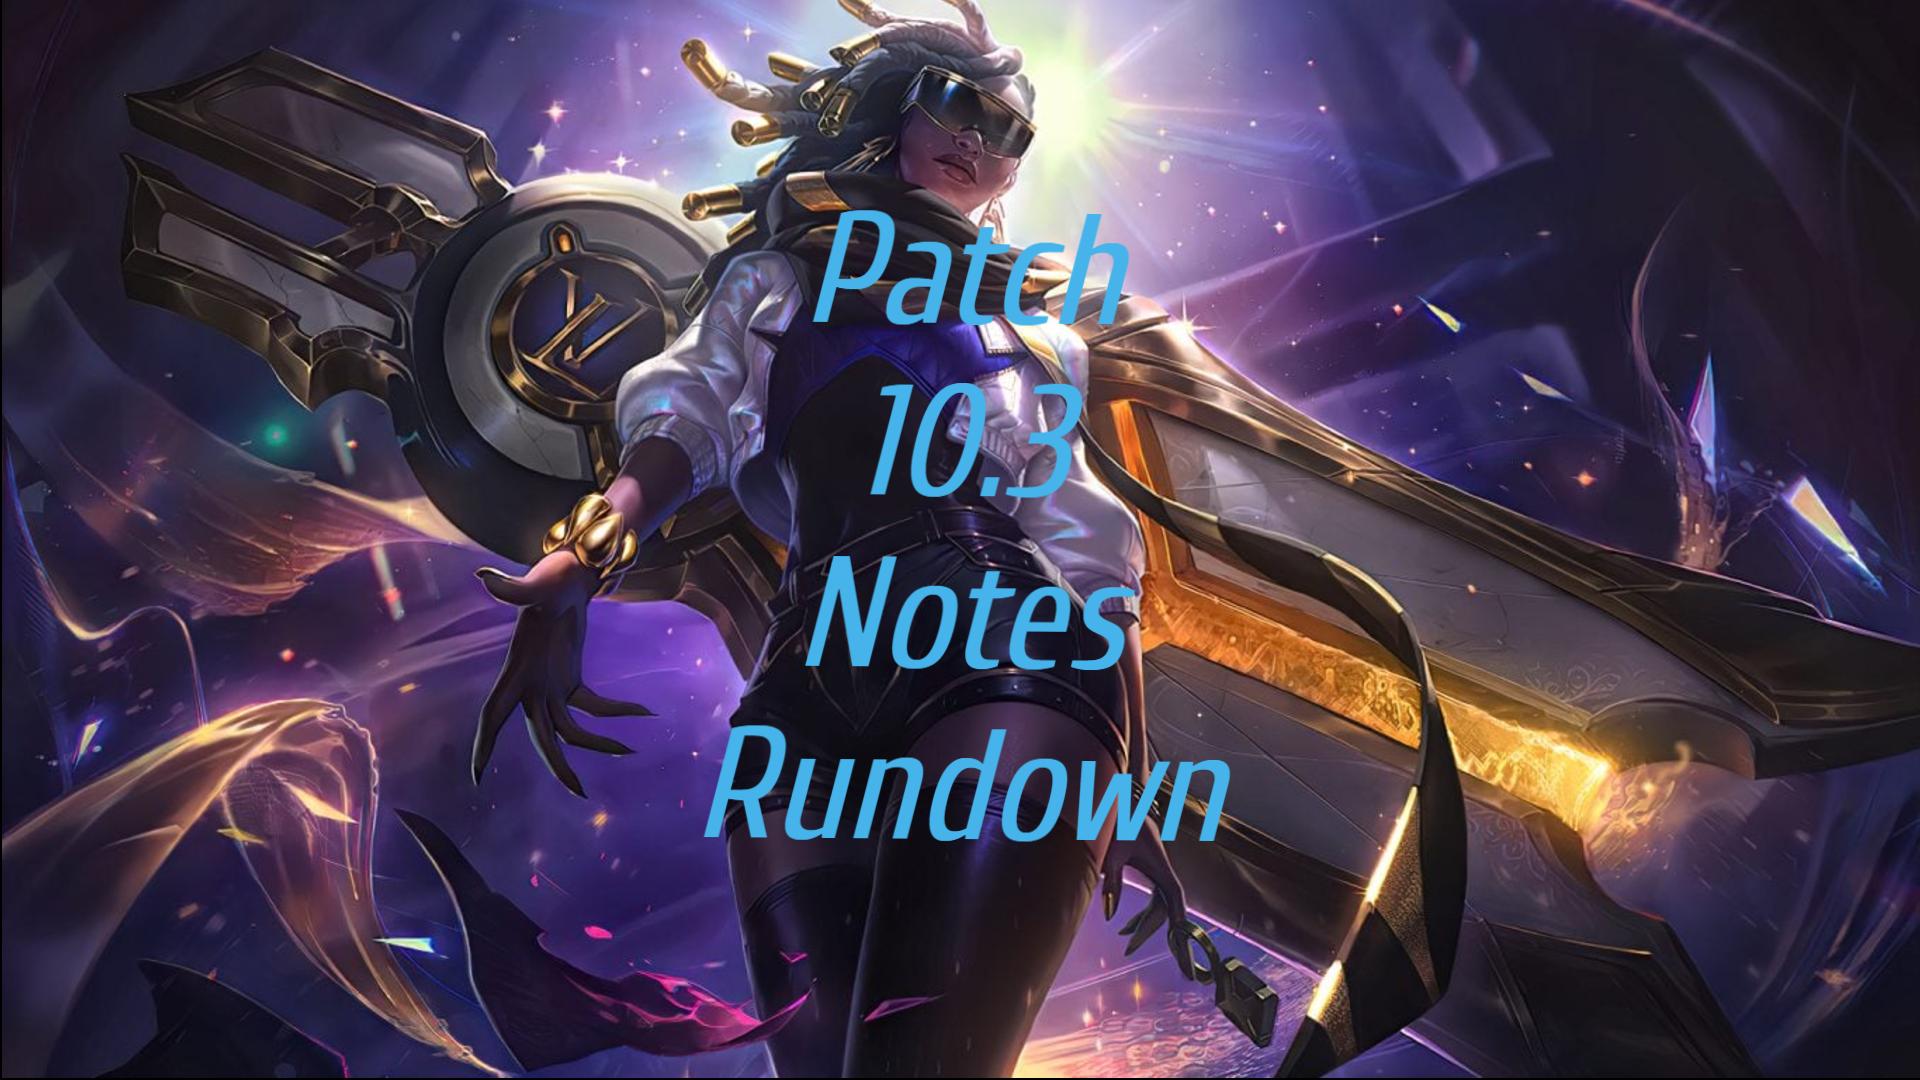 Patch 10.3 notes rundown